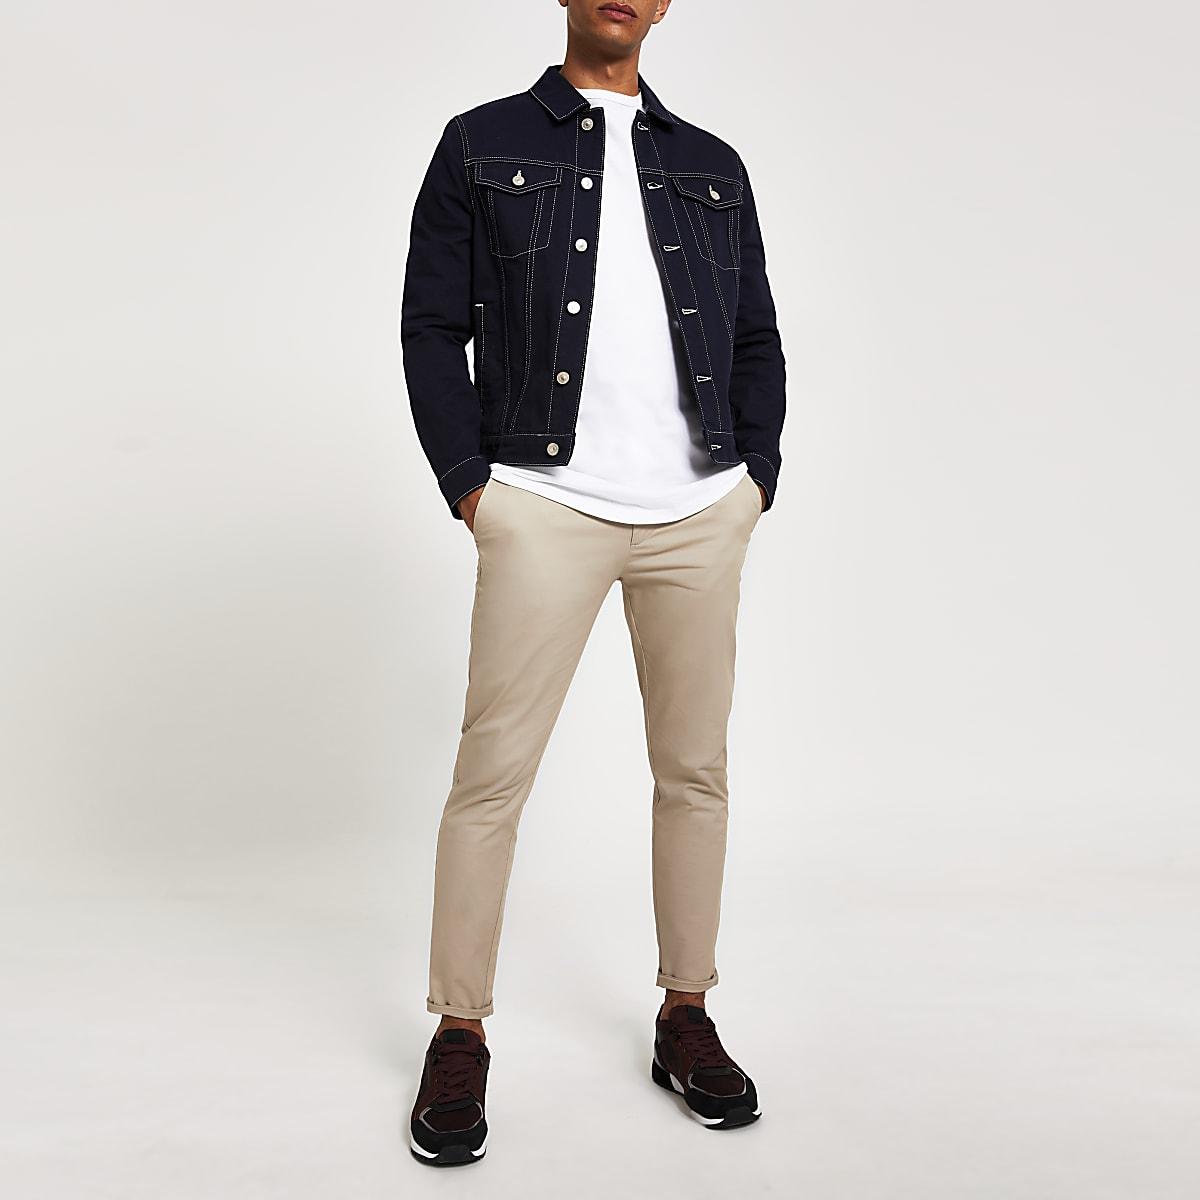 Marineblauw jack met klassieke pasvorm en contrasterend stiksel